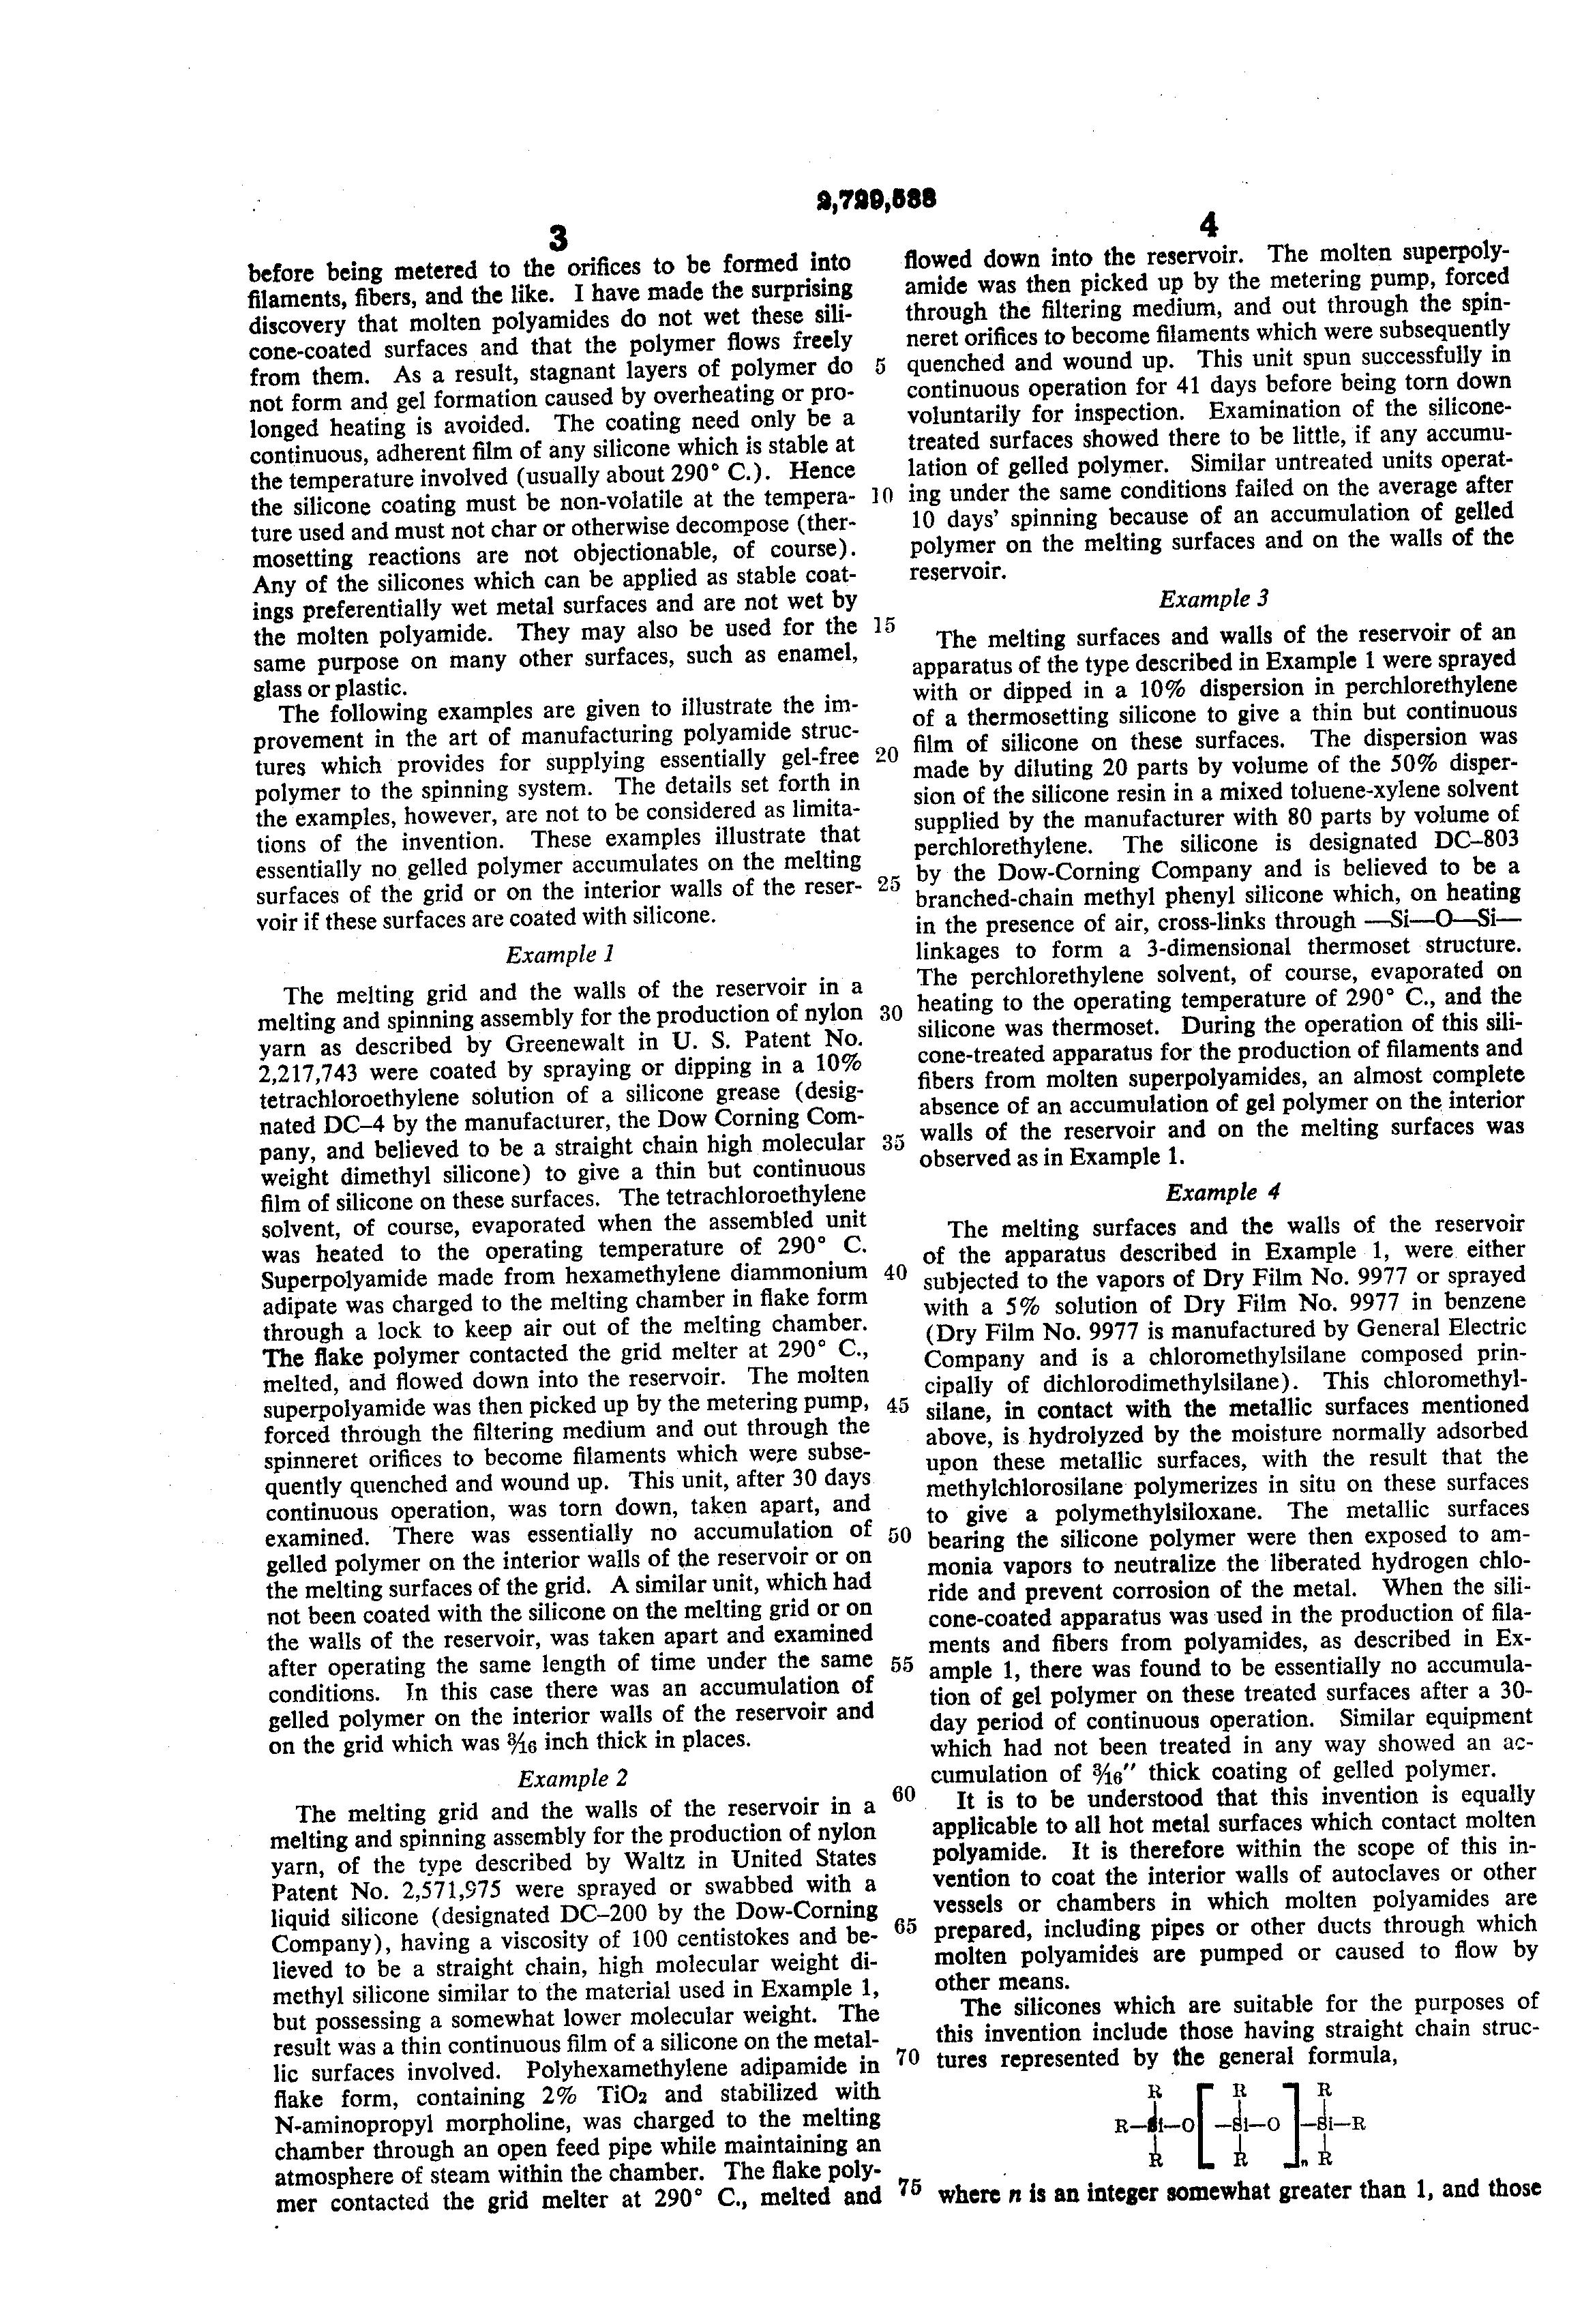 The Basic Nylon Patent Application 88